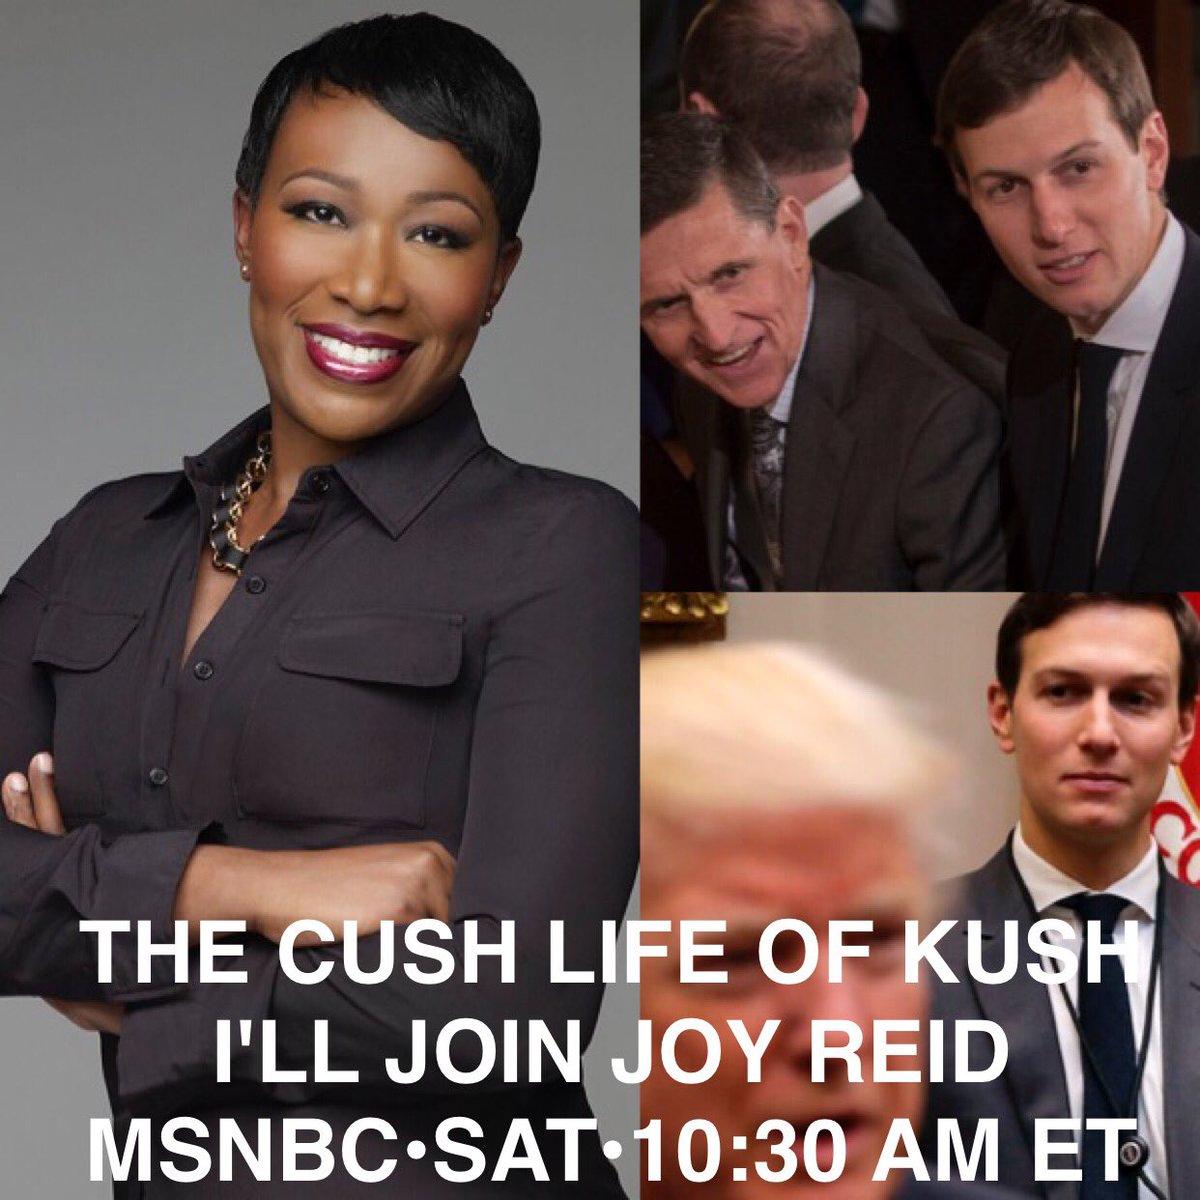 Tune in! I&#39;m joining fabulous @JoyAnnReid on her fabulous show @amjoyshow on @MSNBC at 10:30am ET. #JaredKushner #DonaldTrump <br>http://pic.twitter.com/YzF0Q2vhII